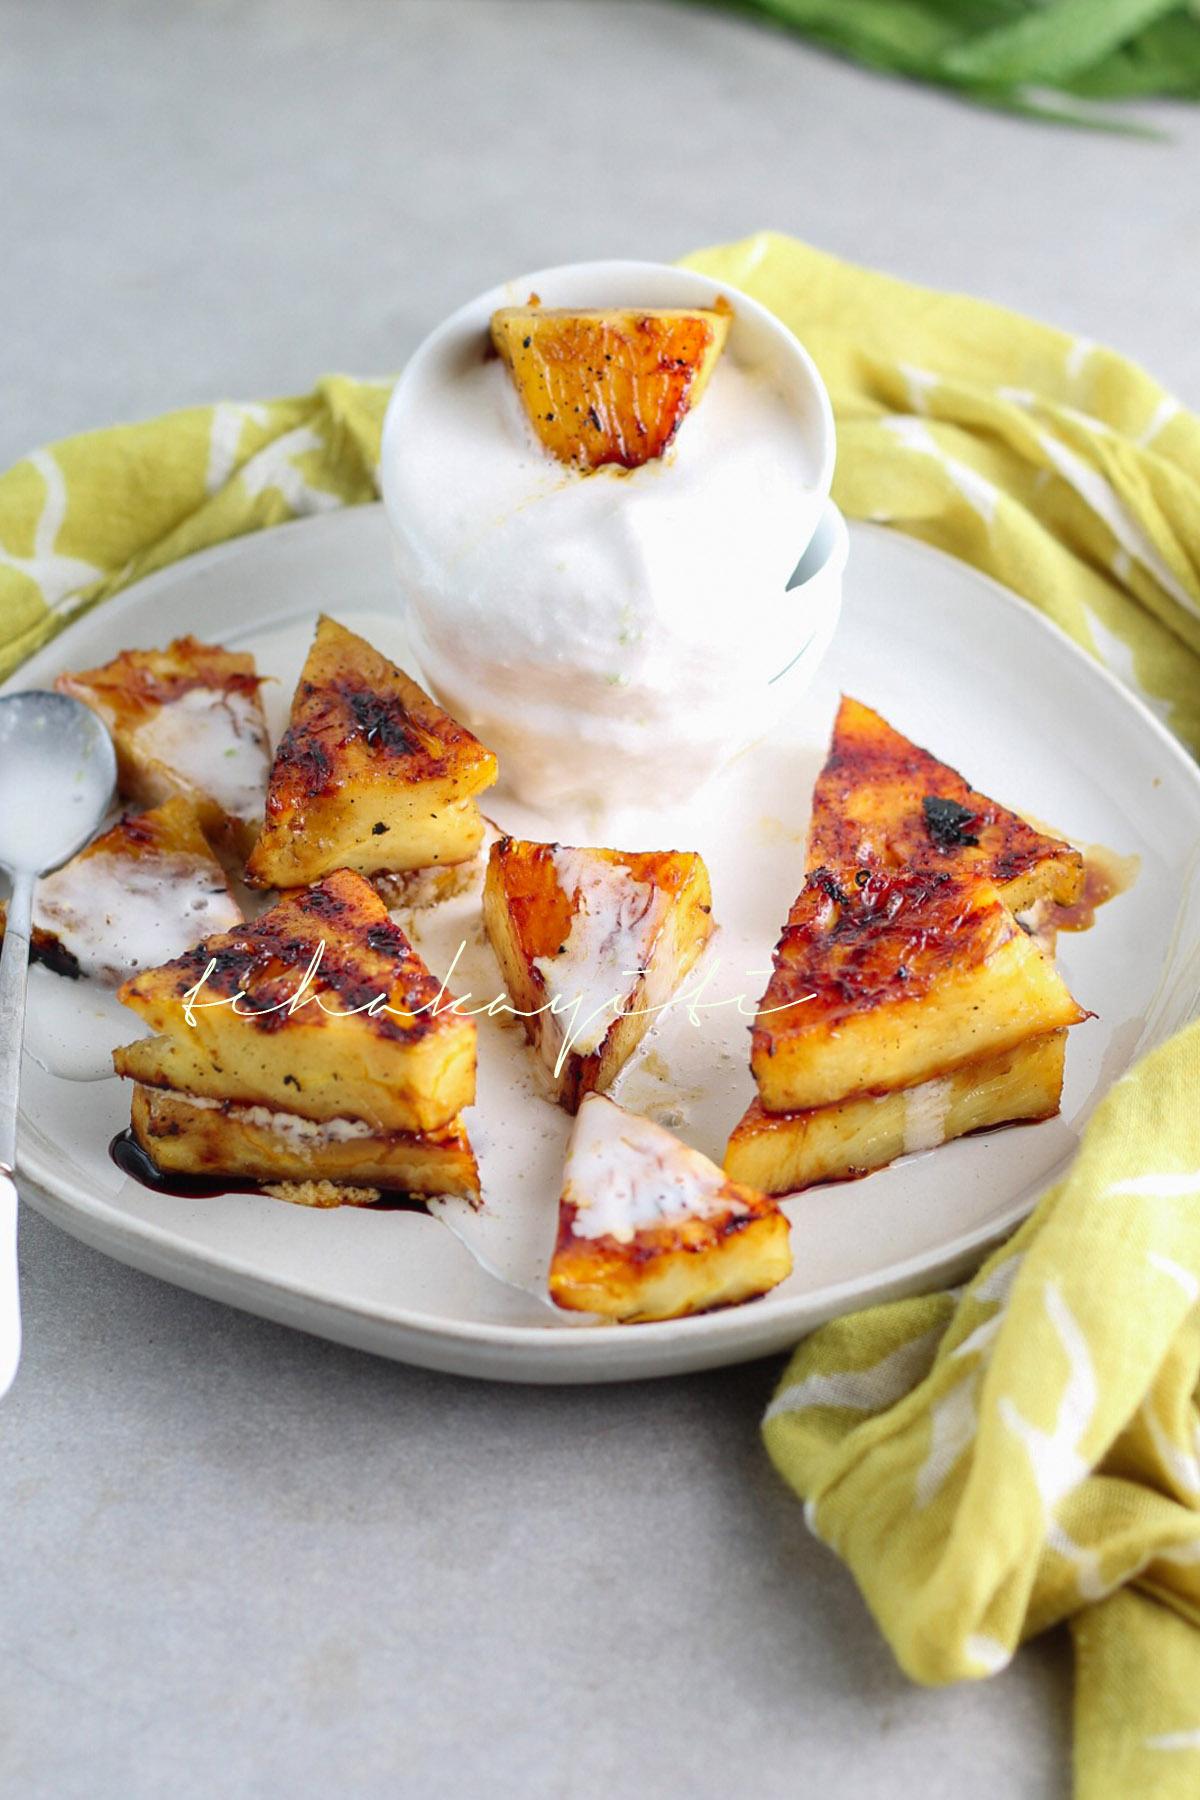 Griled piña colada bites | tchakayiti.com